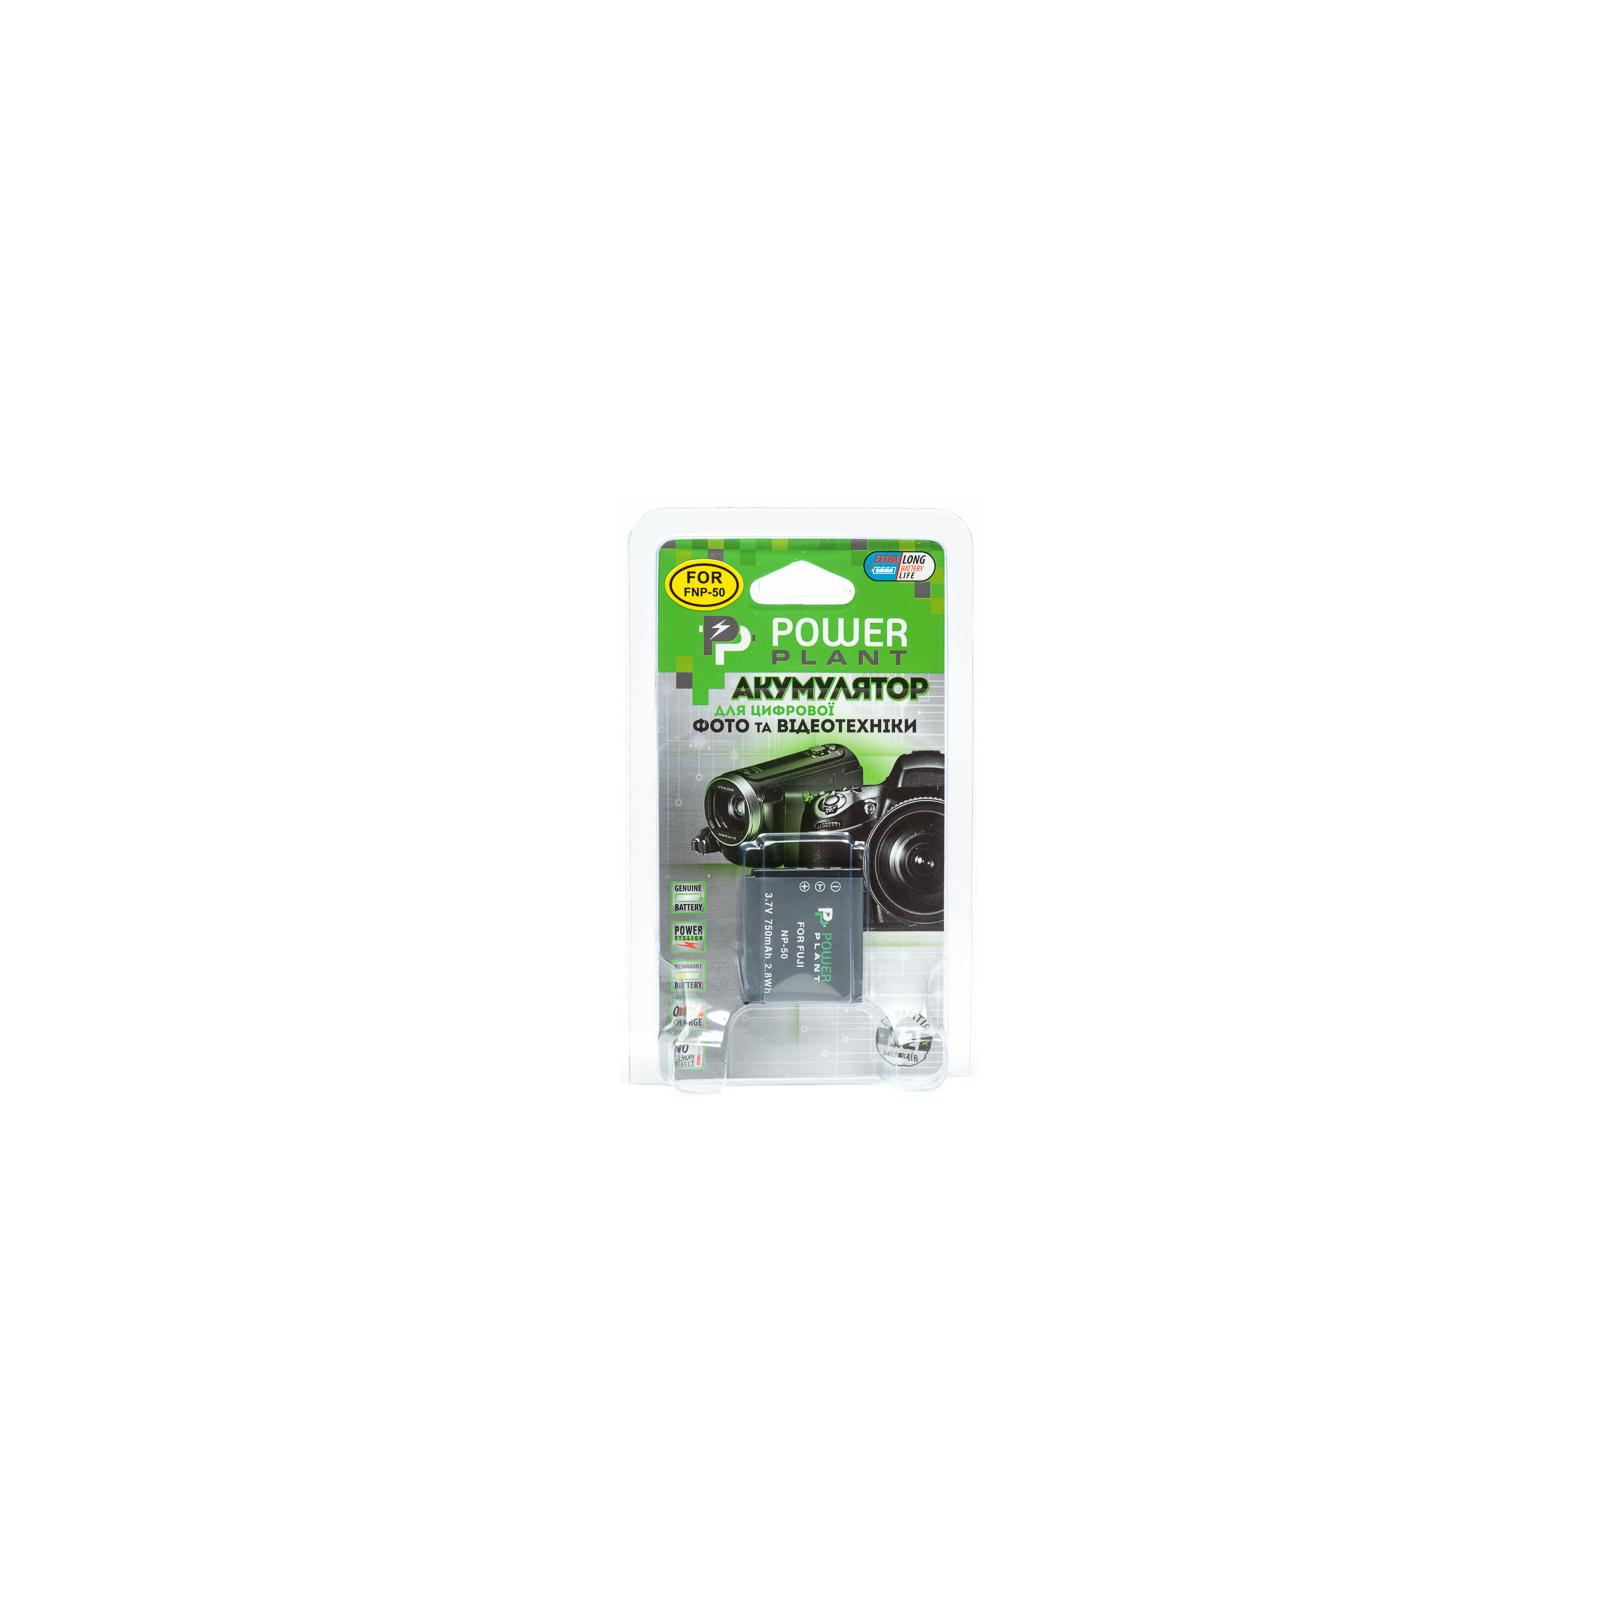 Аккумулятор к фото/видео PowerPlant Kodak KLIC-7004, Fuji NP-50 (DV00DV1223) изображение 2